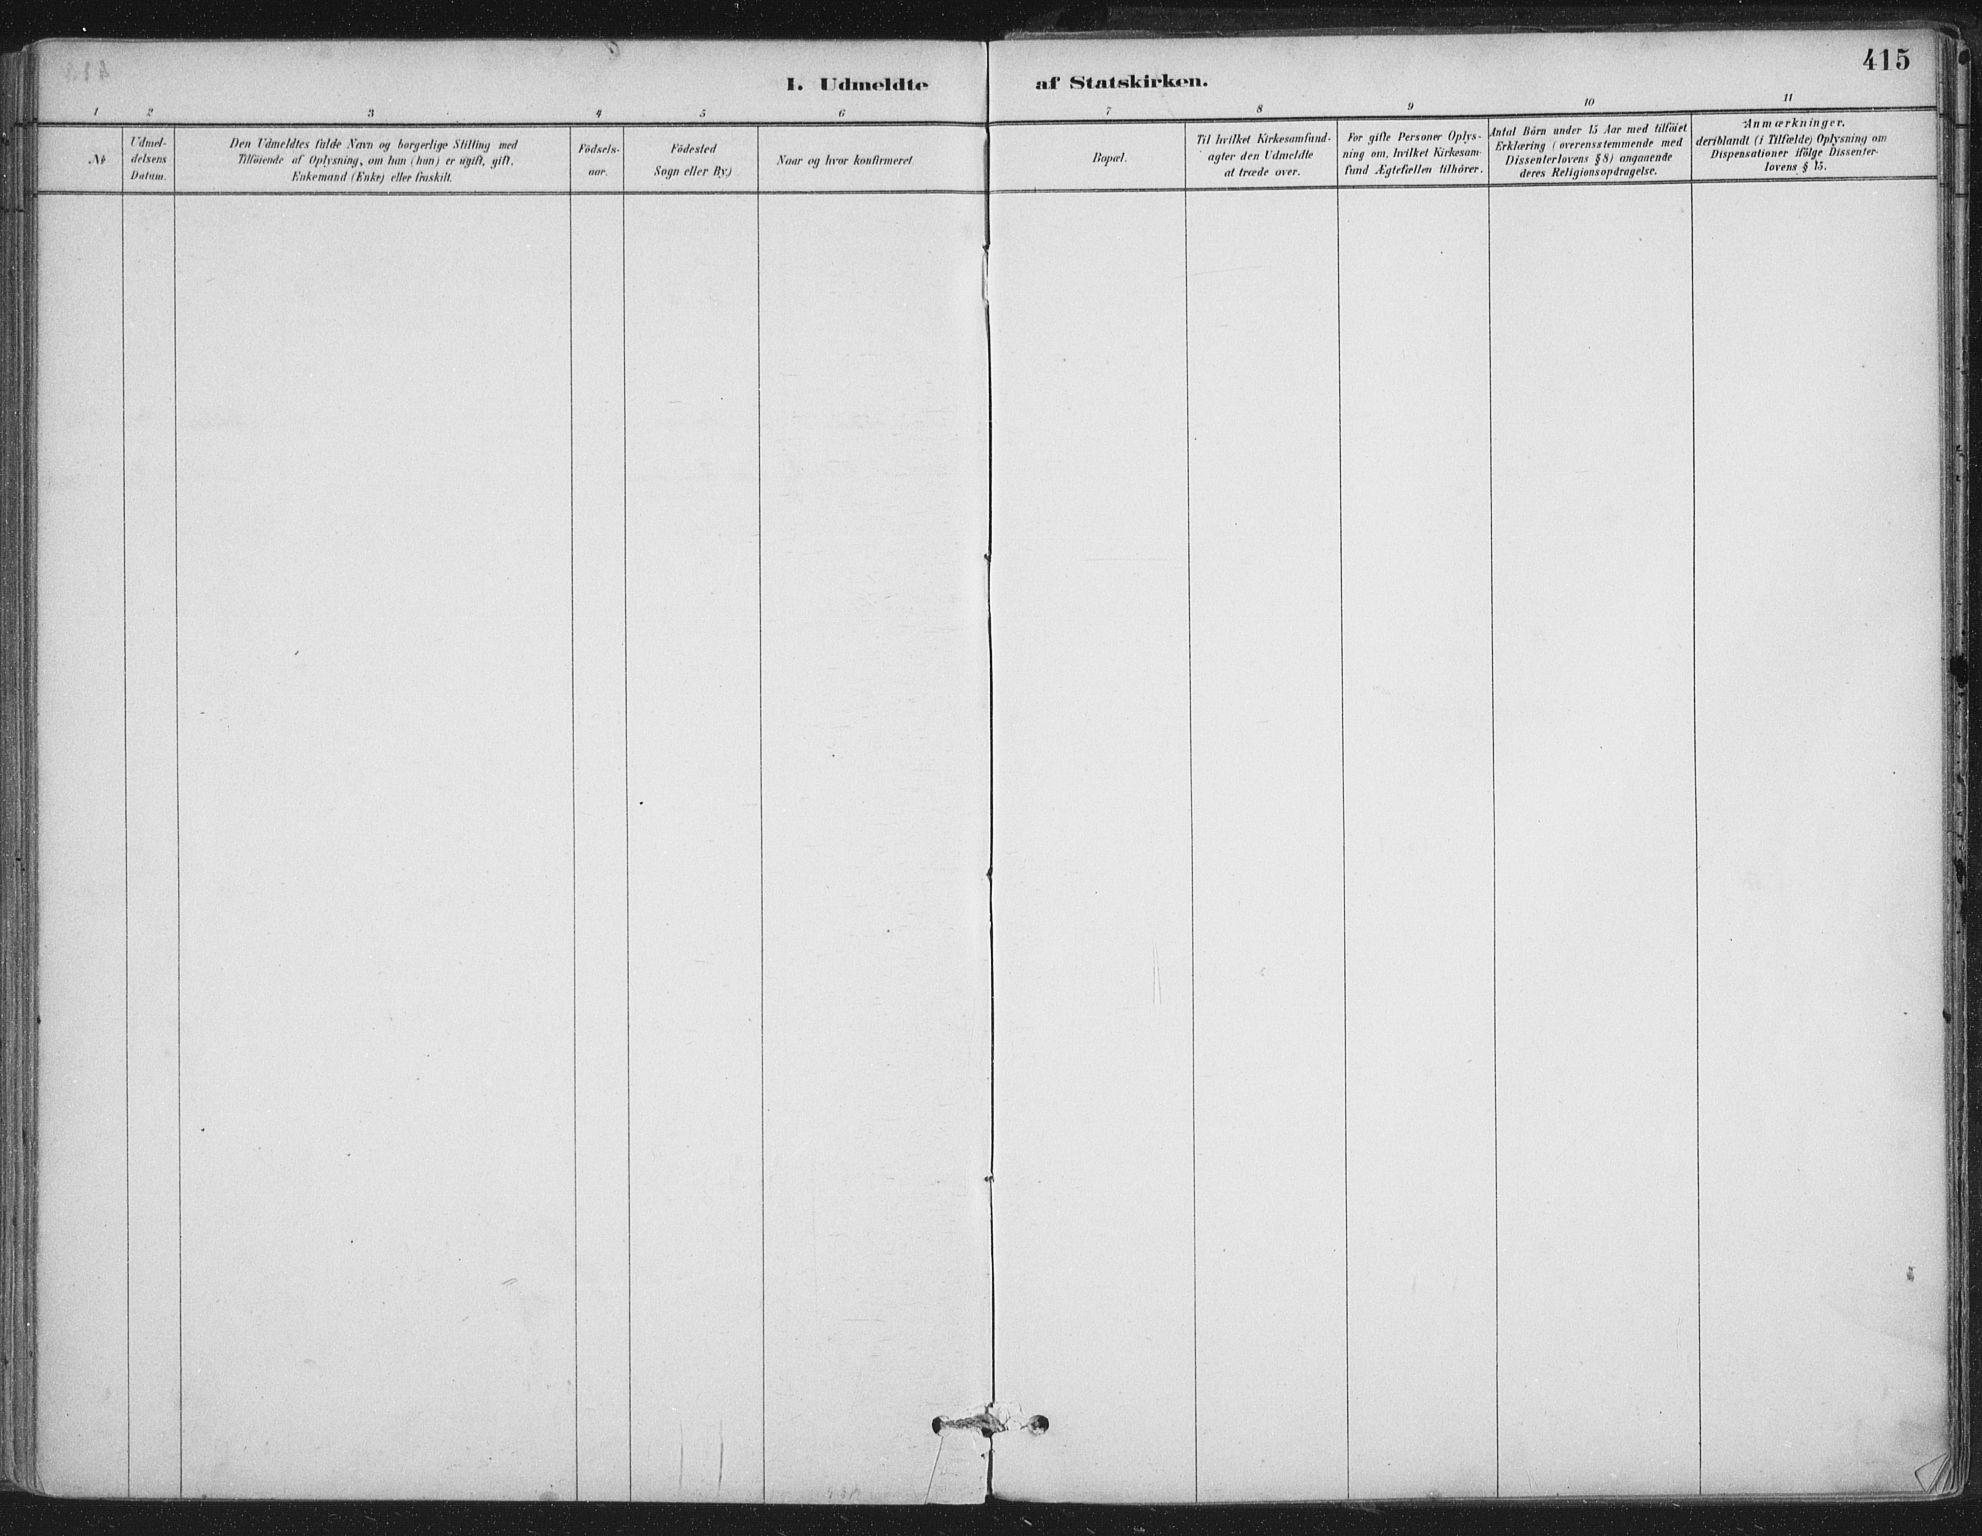 SAT, Ministerialprotokoller, klokkerbøker og fødselsregistre - Nordland, 888/L1244: Ministerialbok nr. 888A10, 1880-1890, s. 415